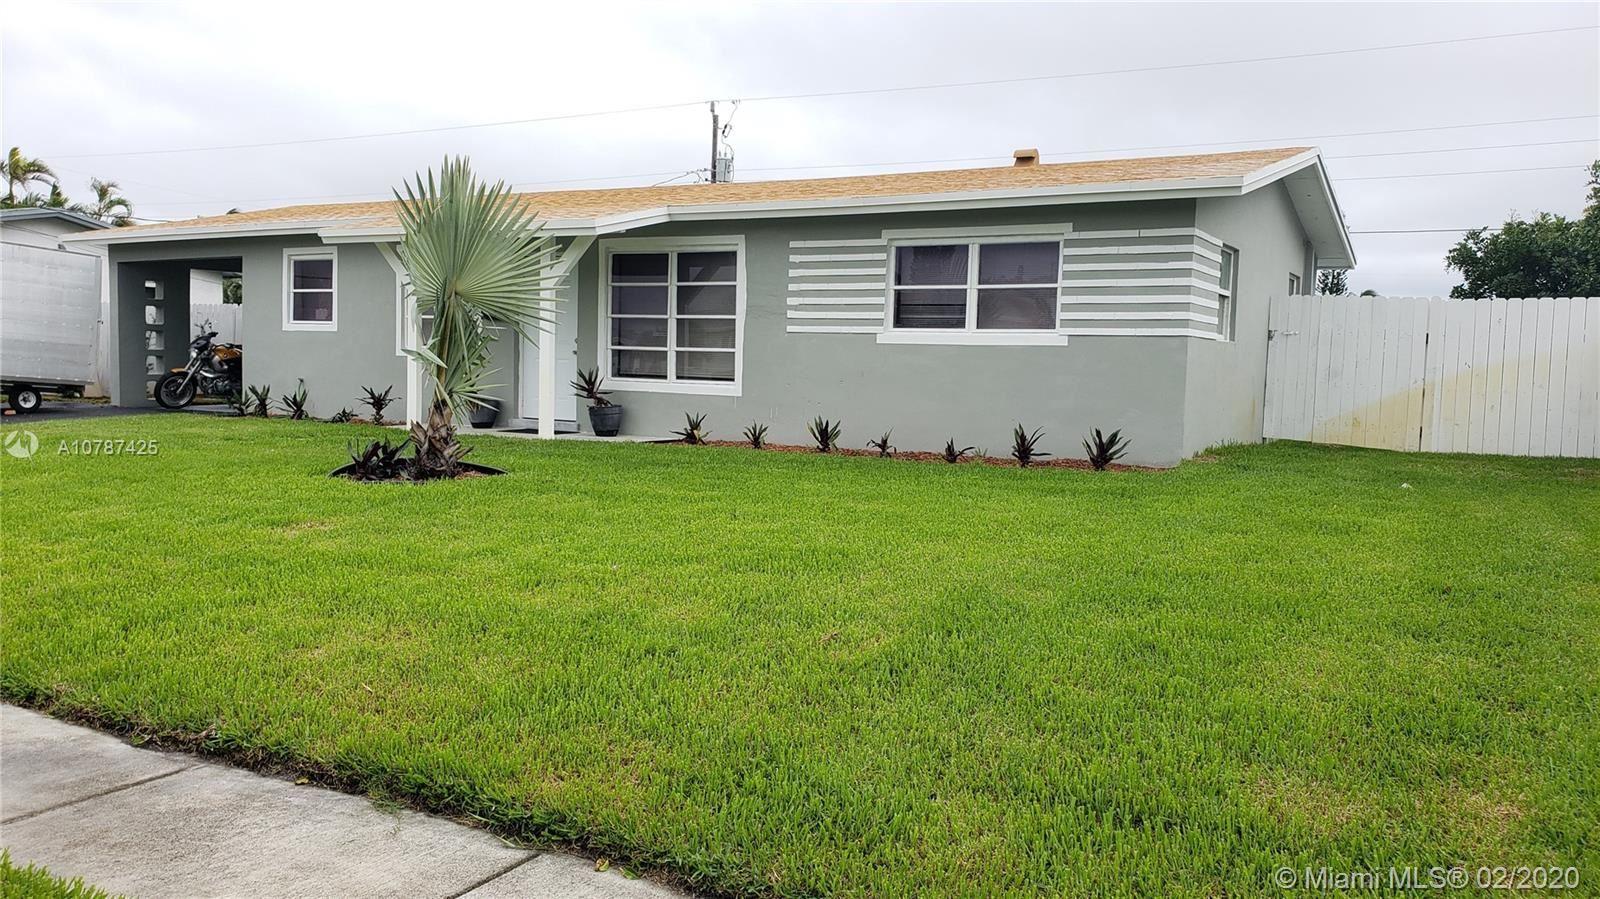 1312 SE 1st Ave, Deerfield Beach, FL 33441 - MLS#: A10787425